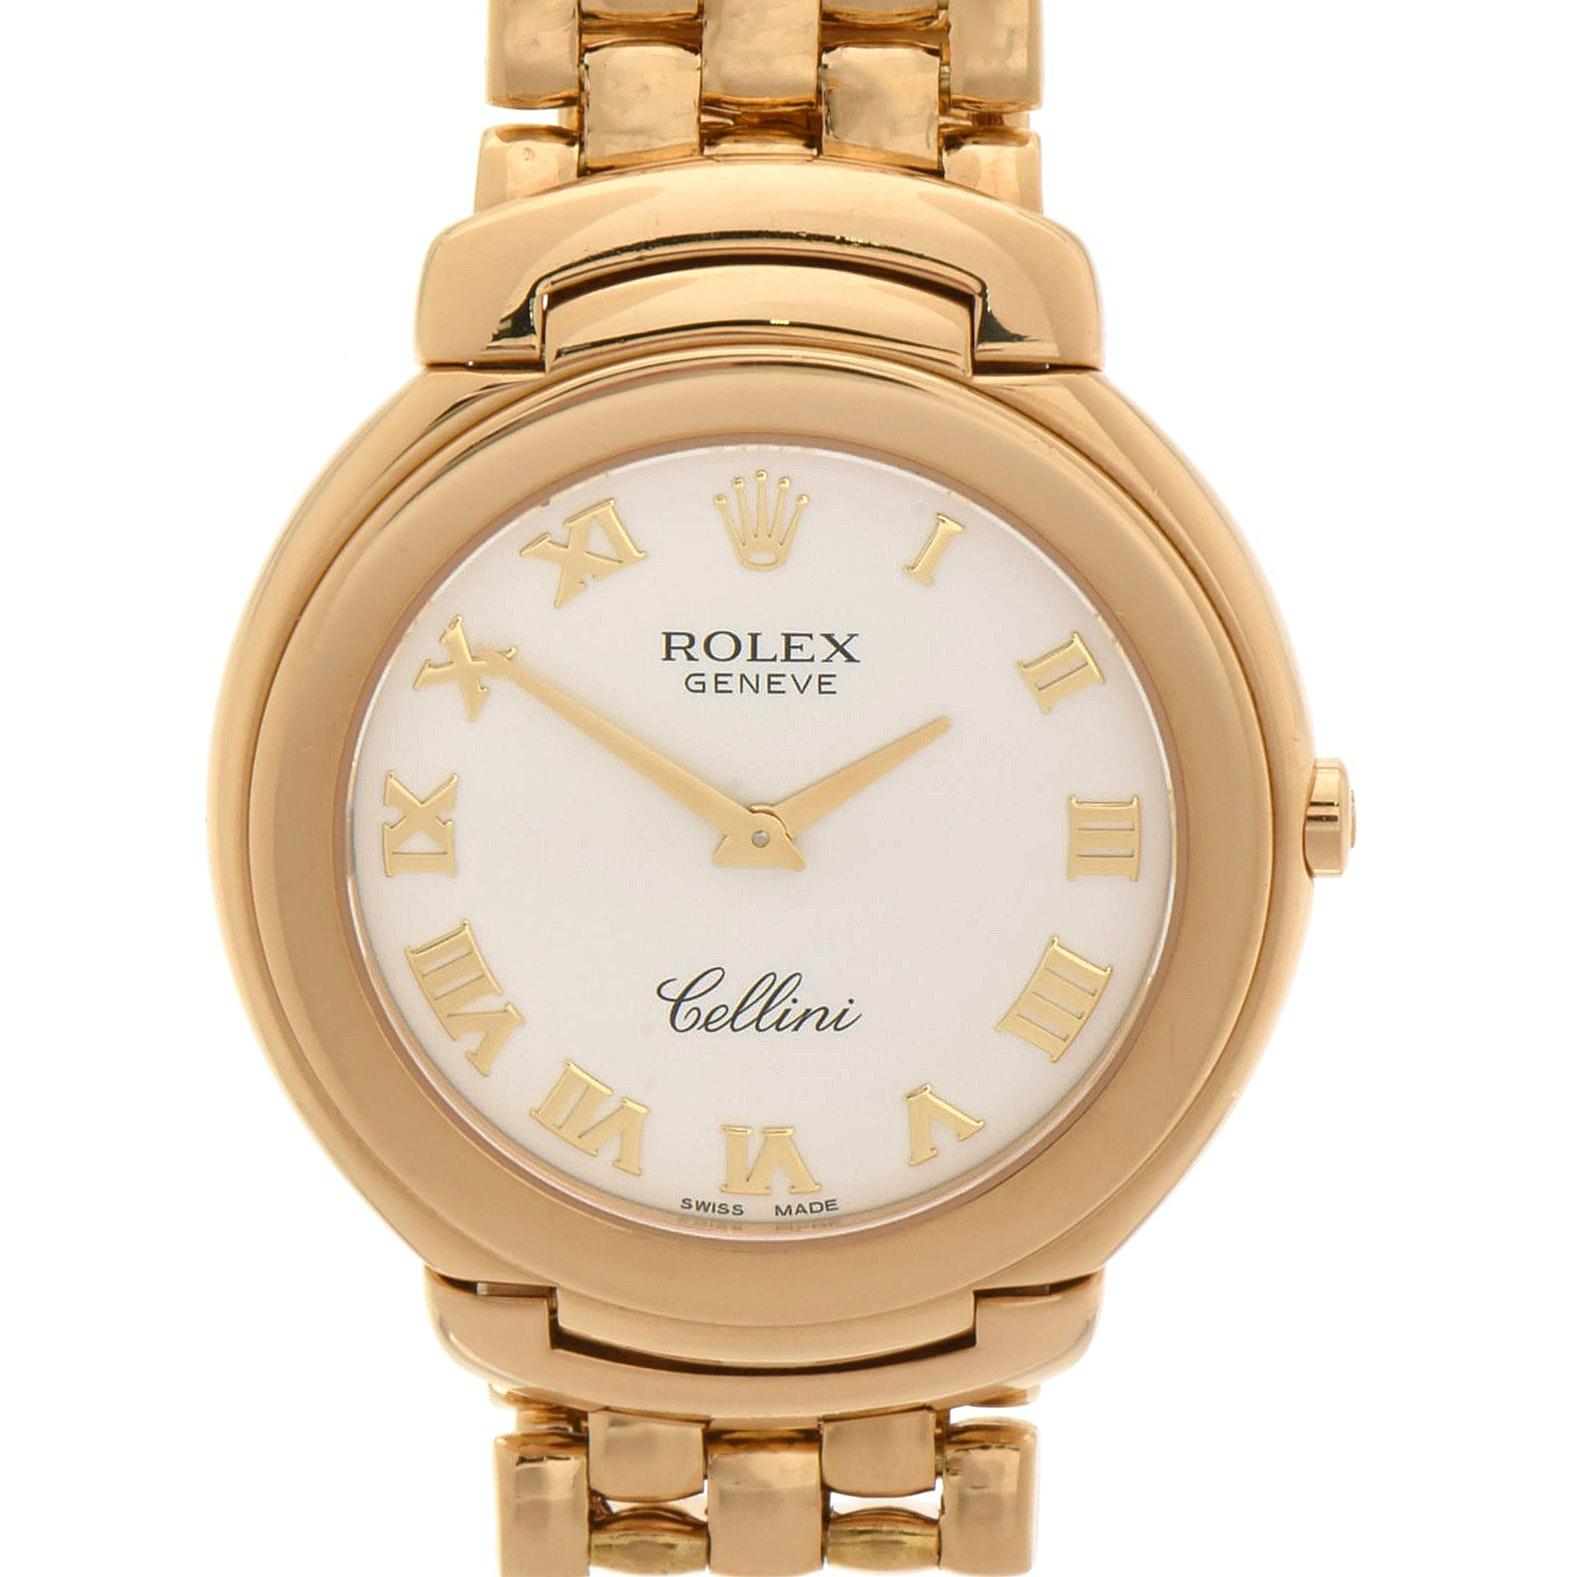 Rolex Cellini 18K Yellow Gold Quartz Wristwatch, Circa 1990s